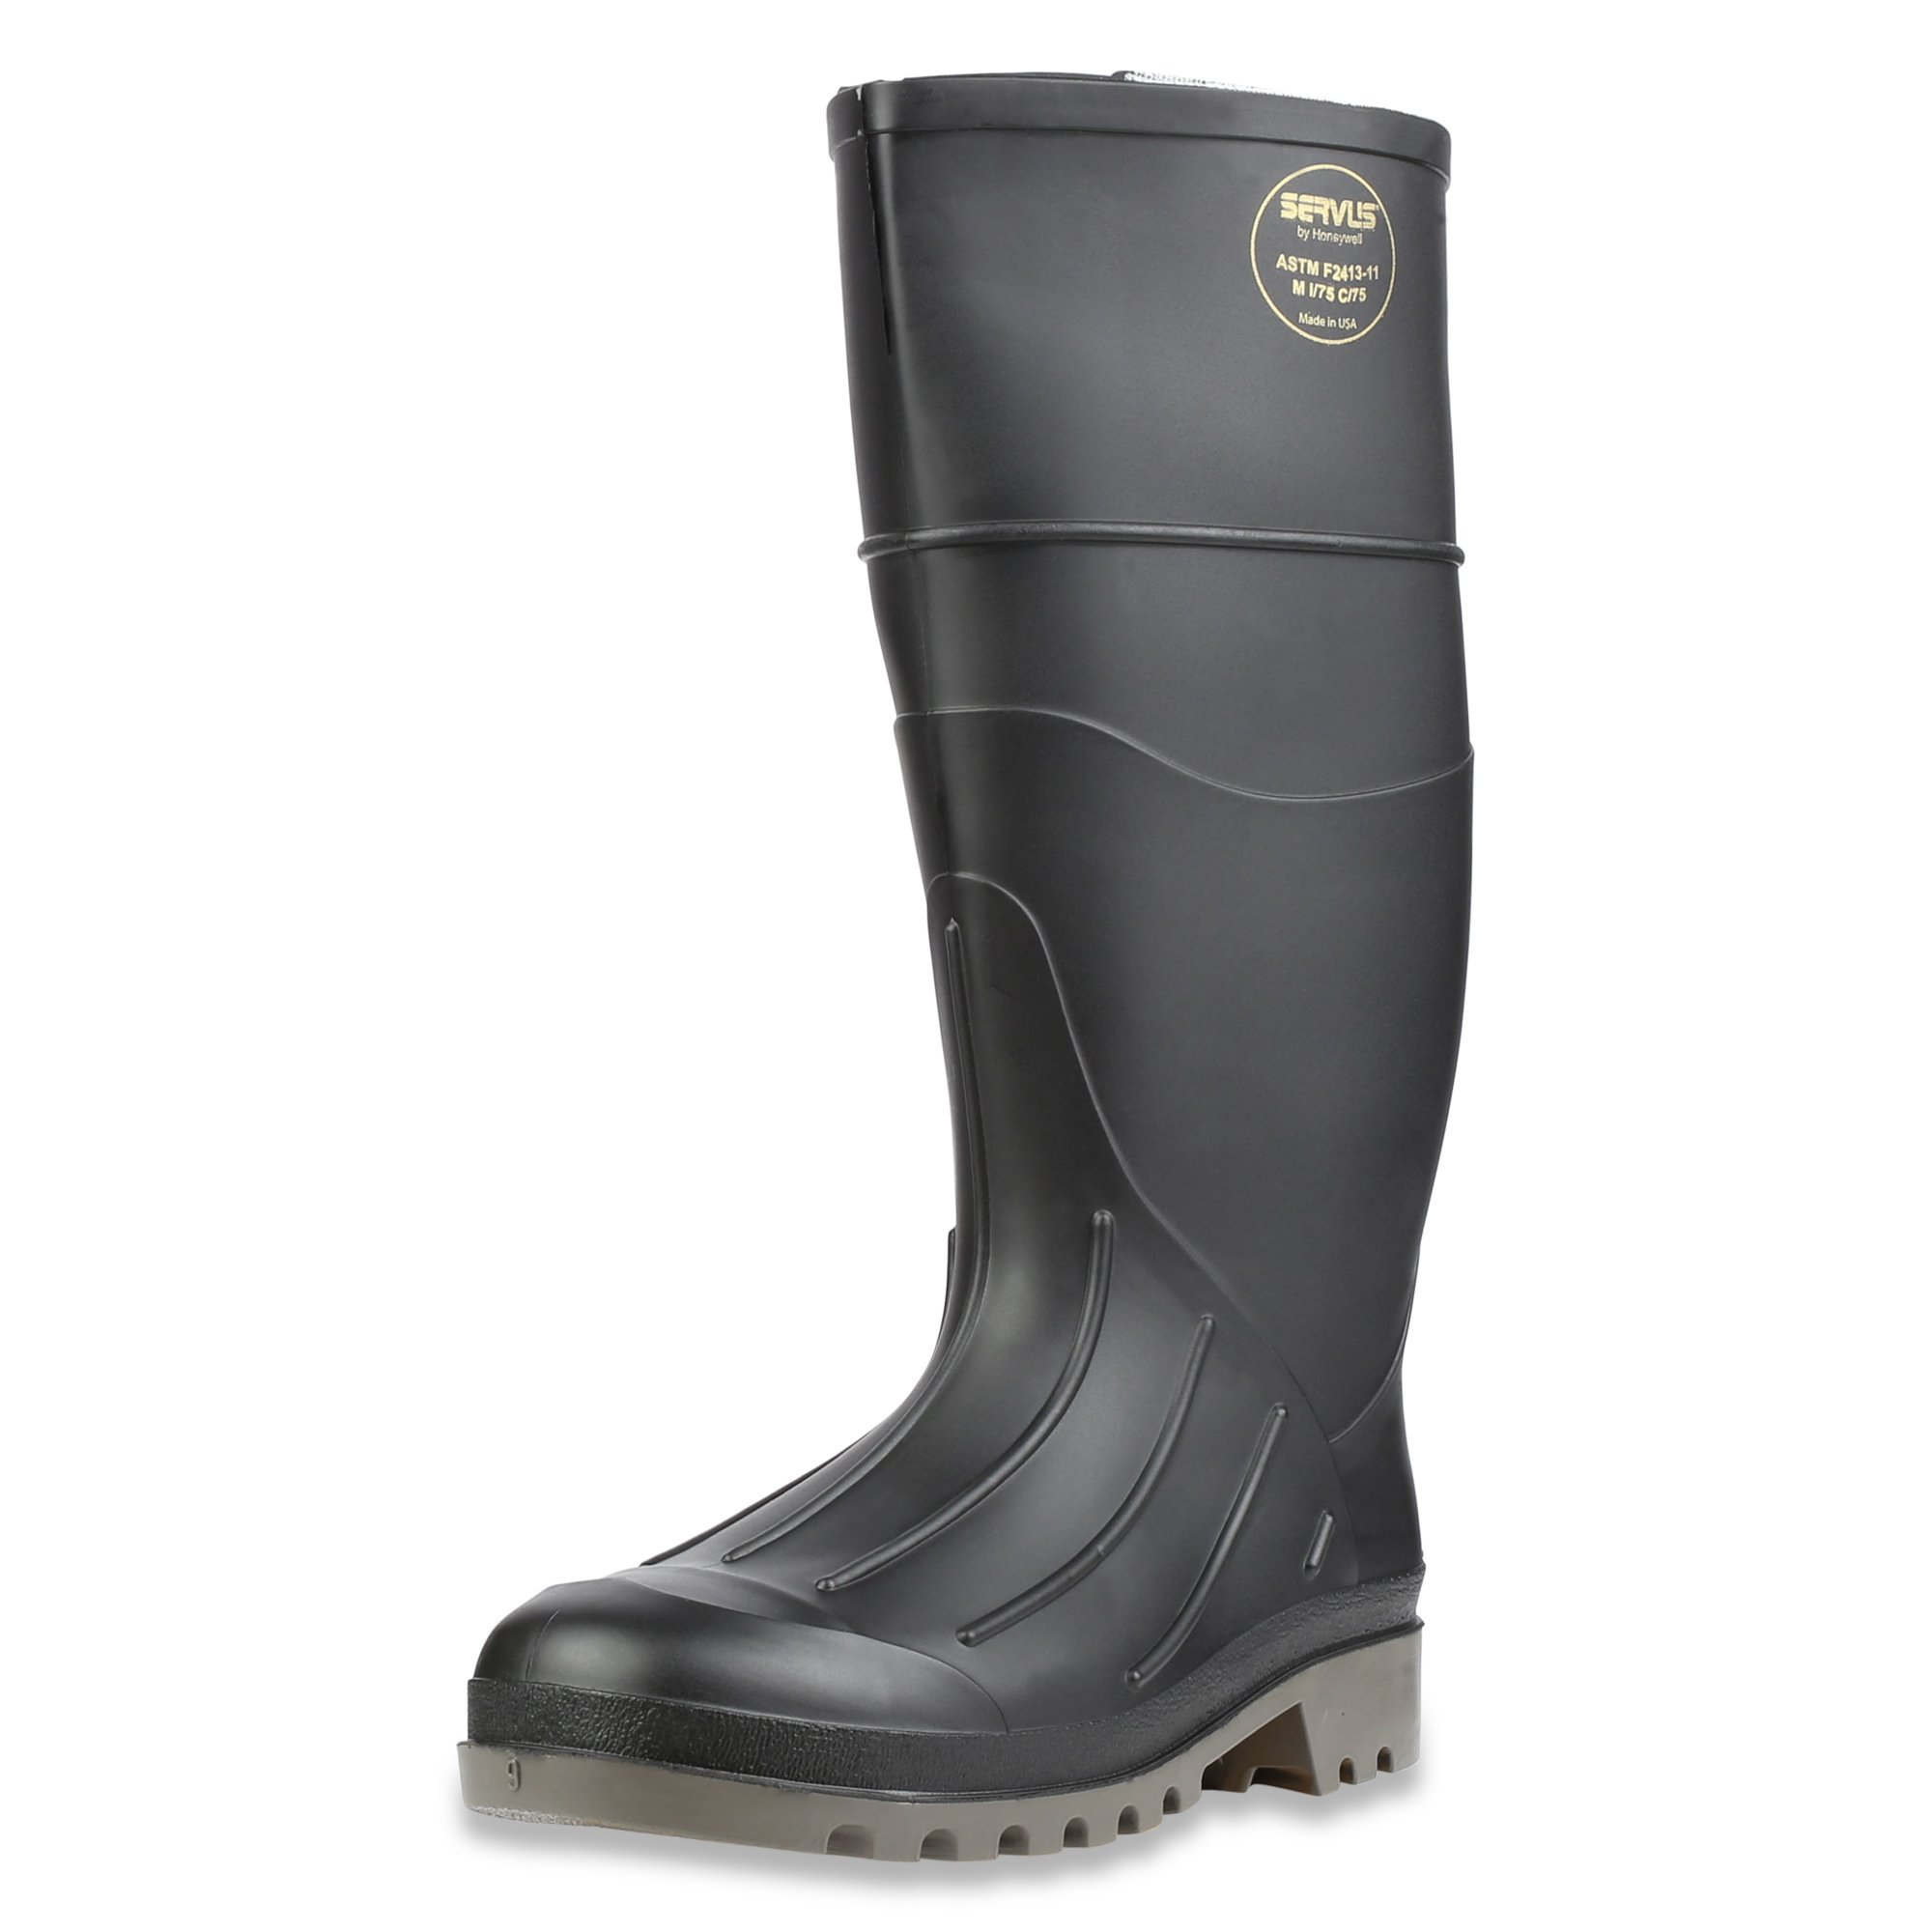 Servus Iron Duke 15'' PVC Polyblend Soft Toe Men's Work Boots, Black & Gray (18802) by Honeywell